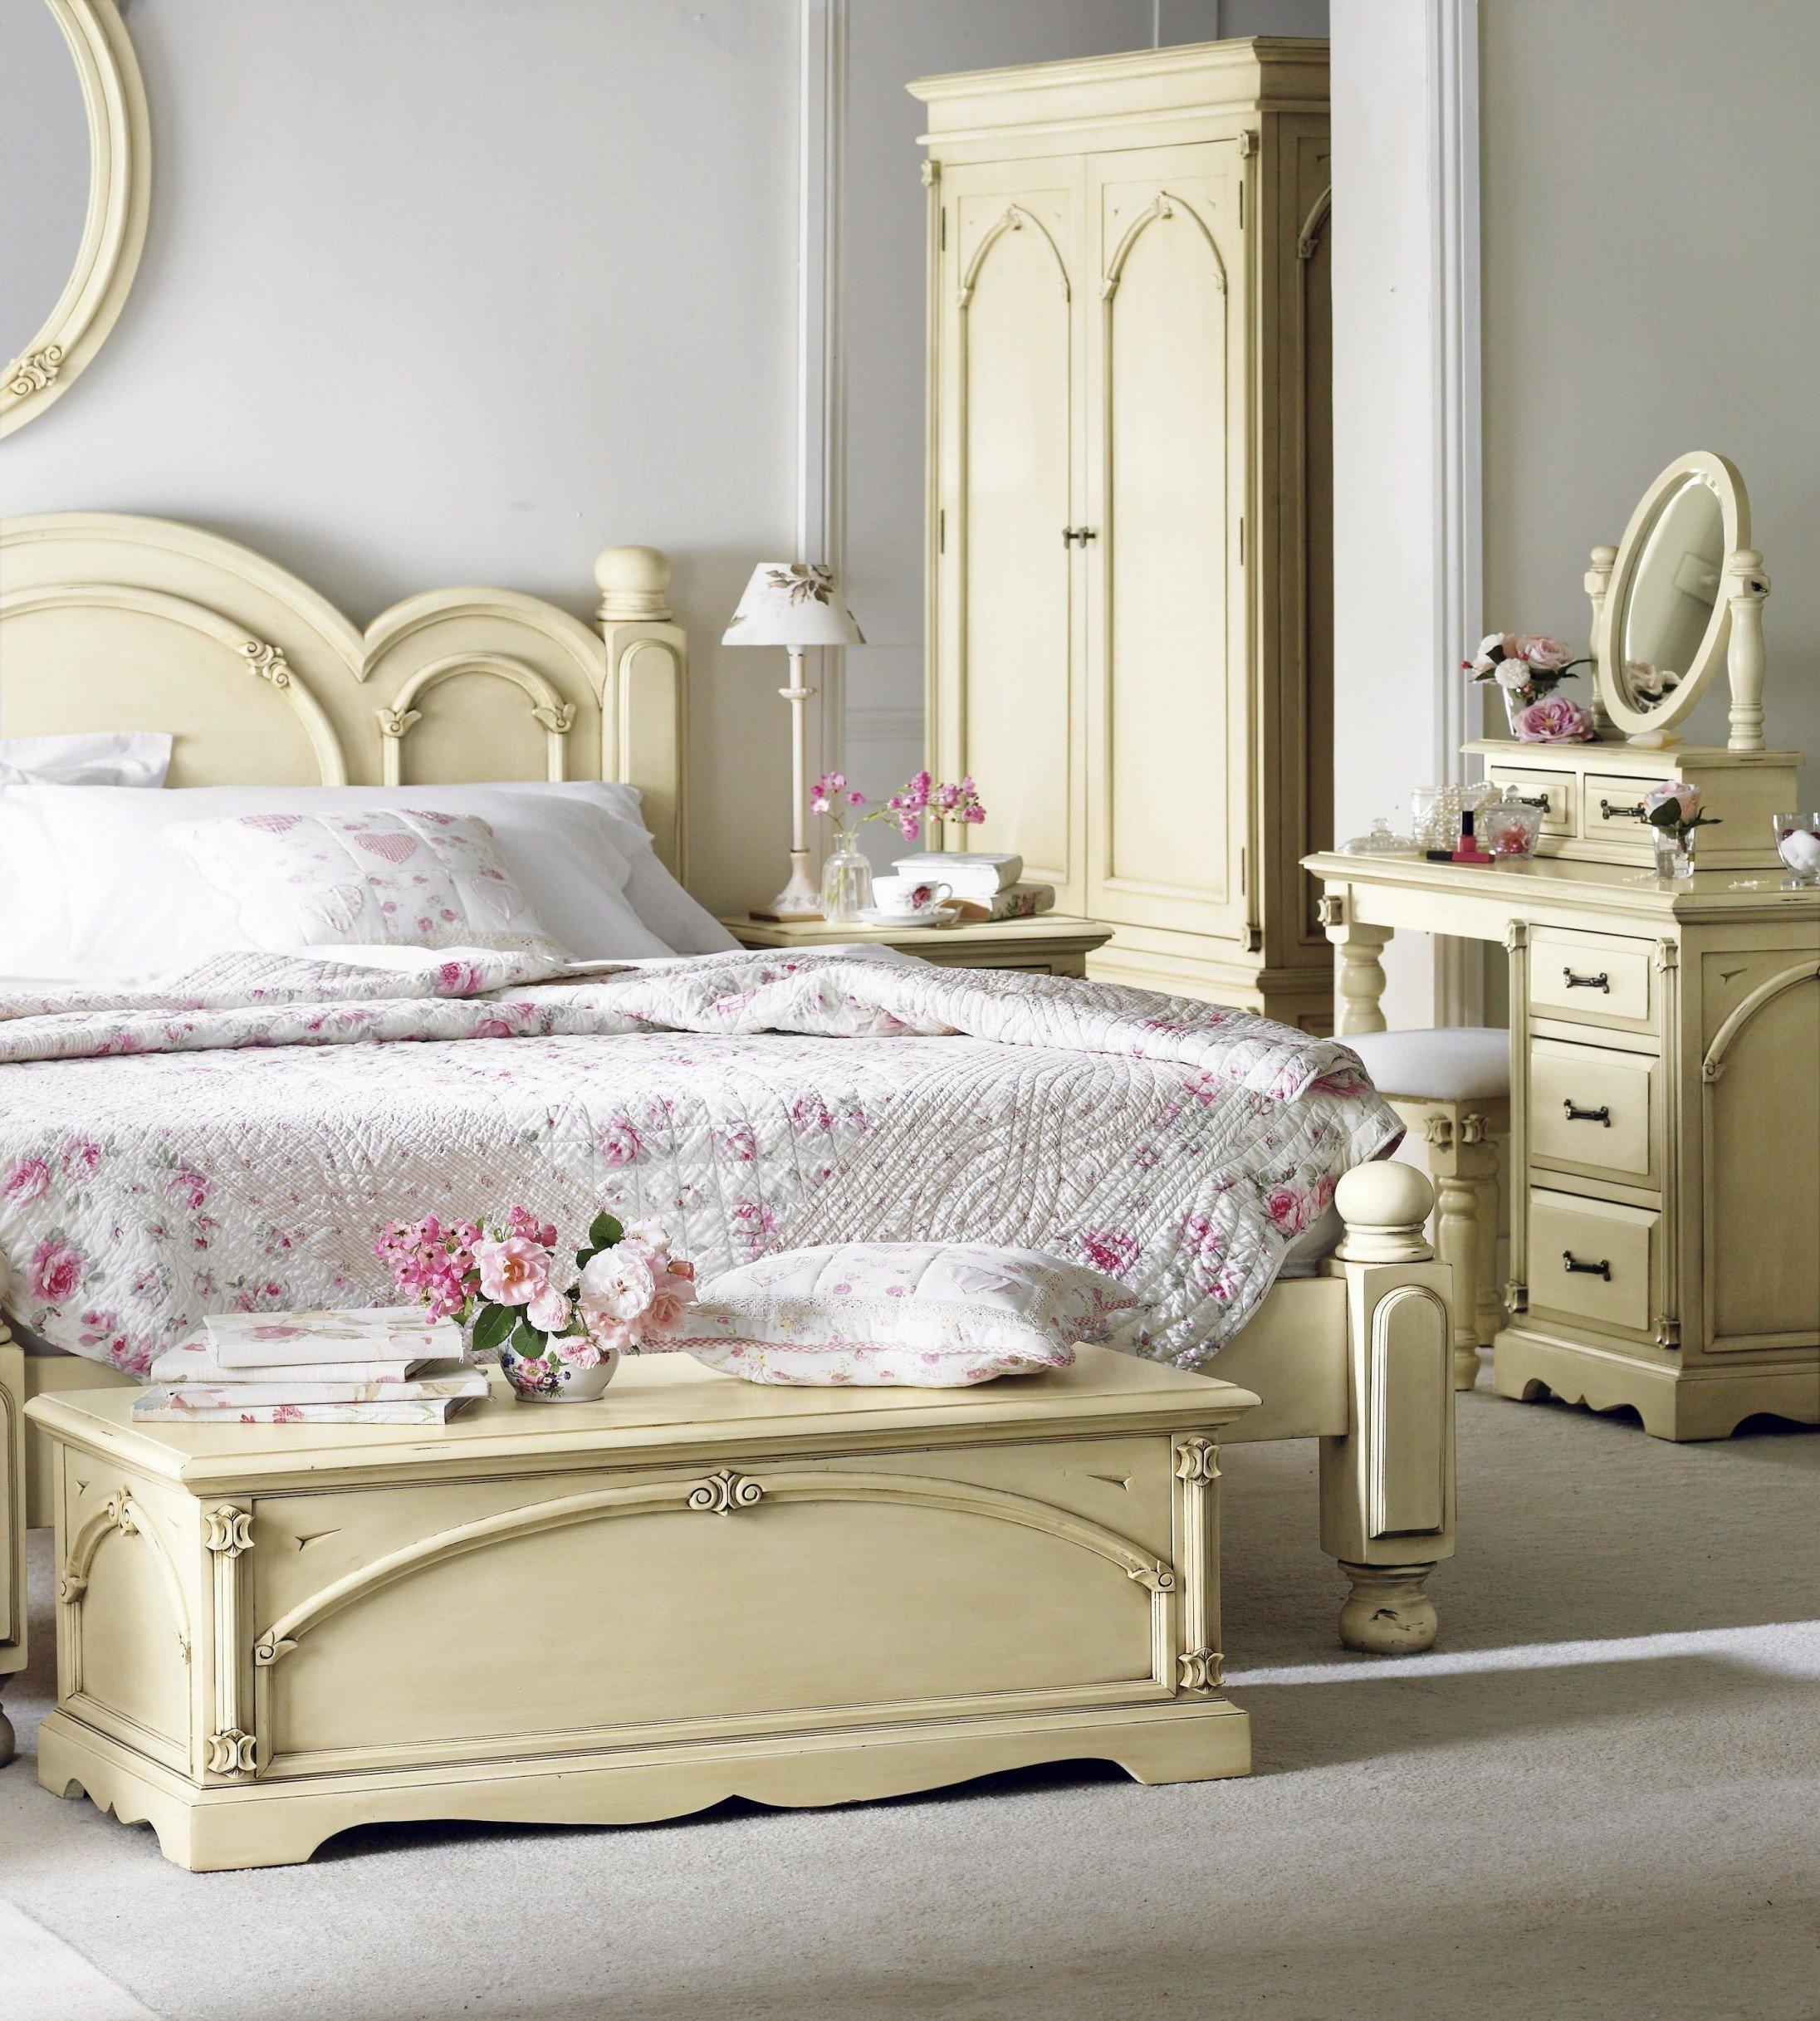 Girls Teenagers Bedroom Ideas Lovely Teen Girls Bedroom Ideas Bedroom Cool Gray Bedroom Decor